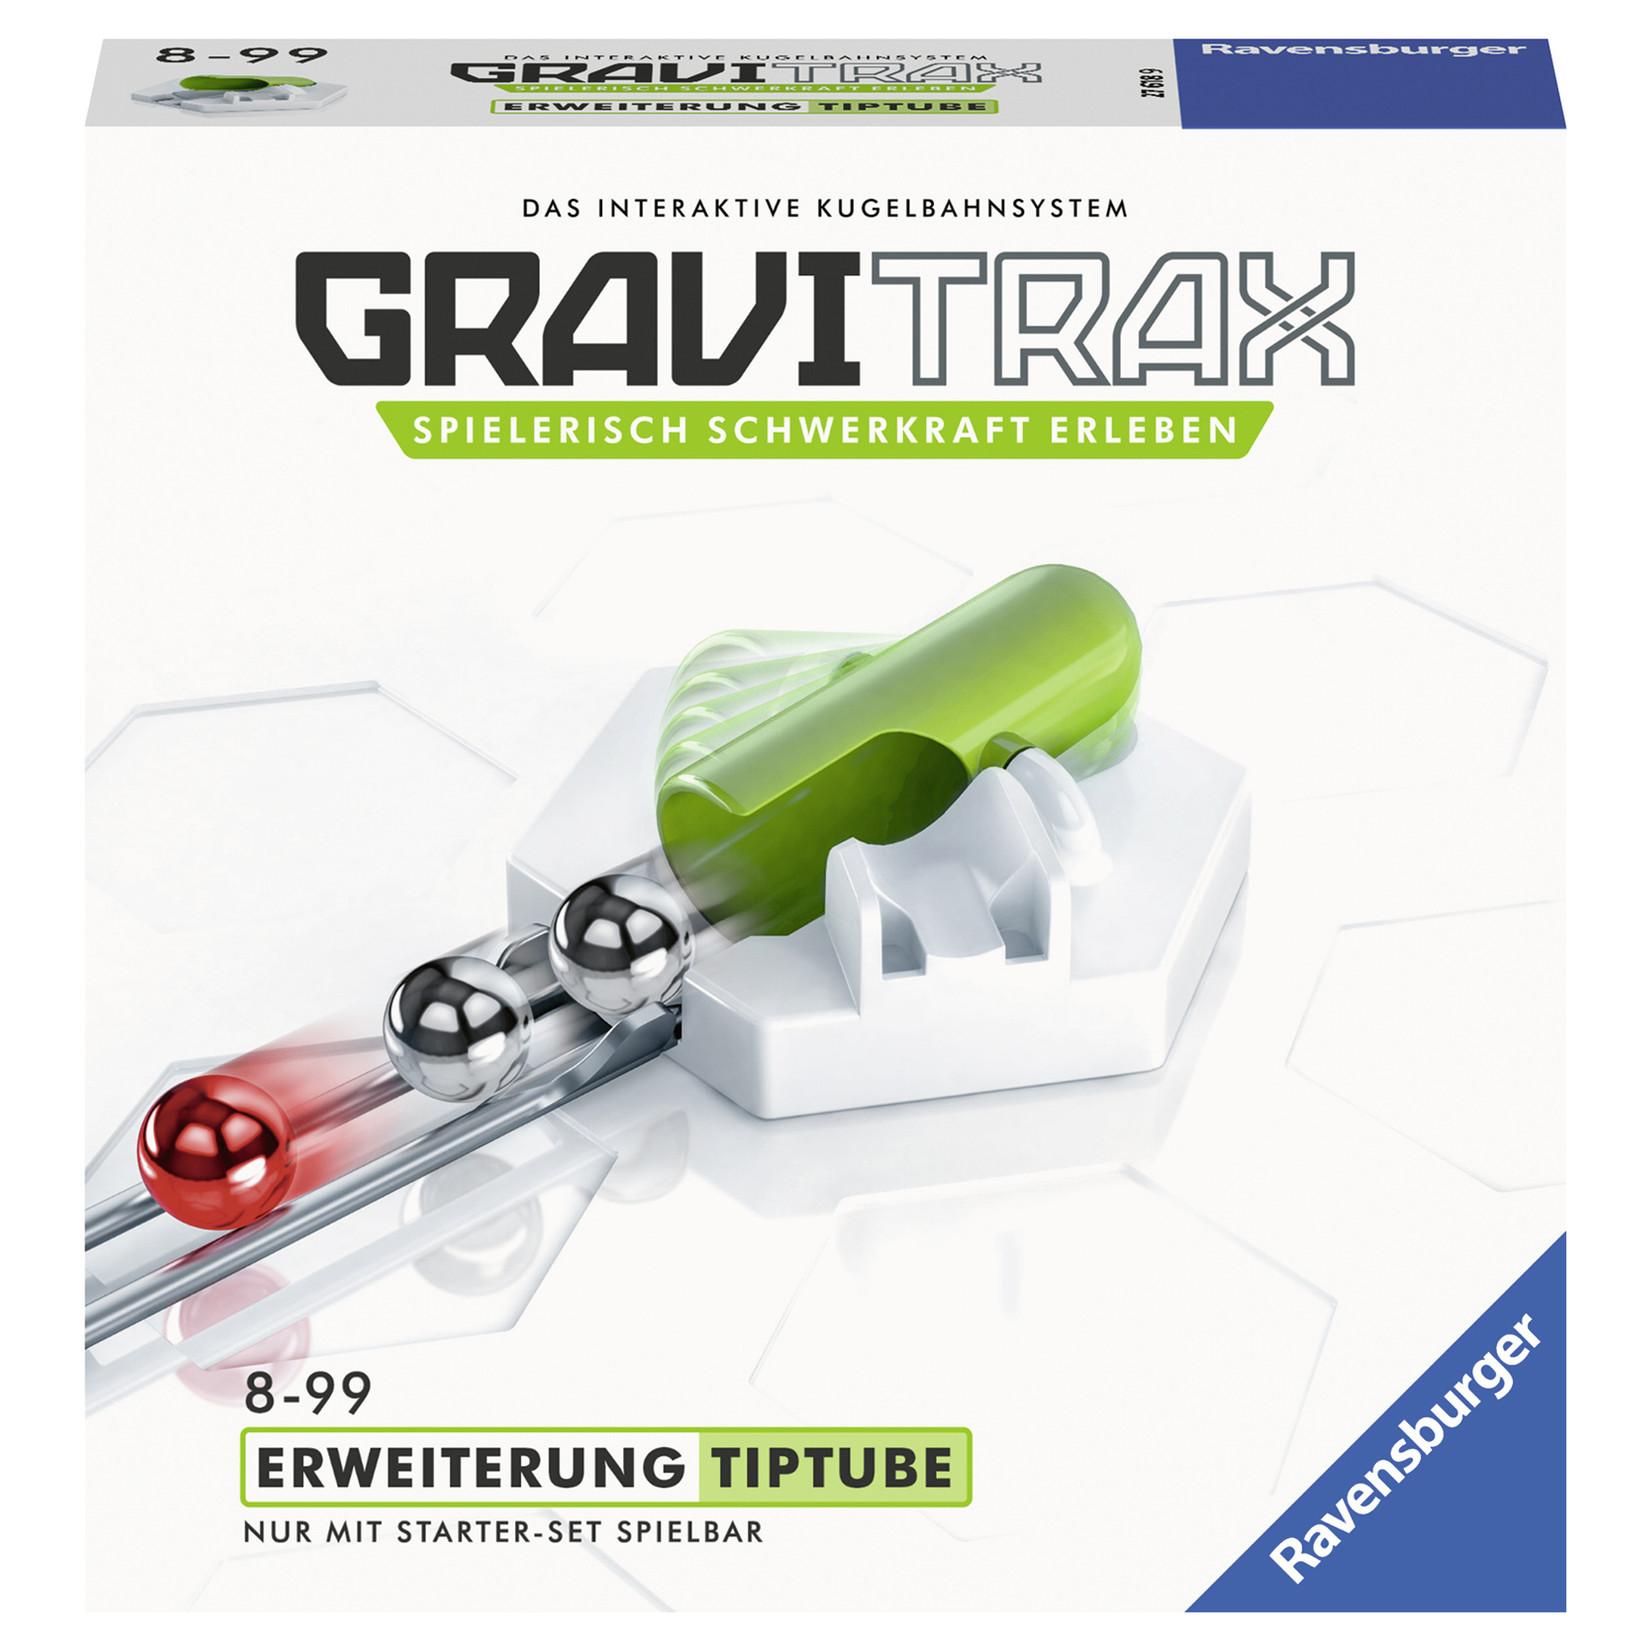 RAVENSBURGER GRAVITRAX ACCESSORY TIP TUBE